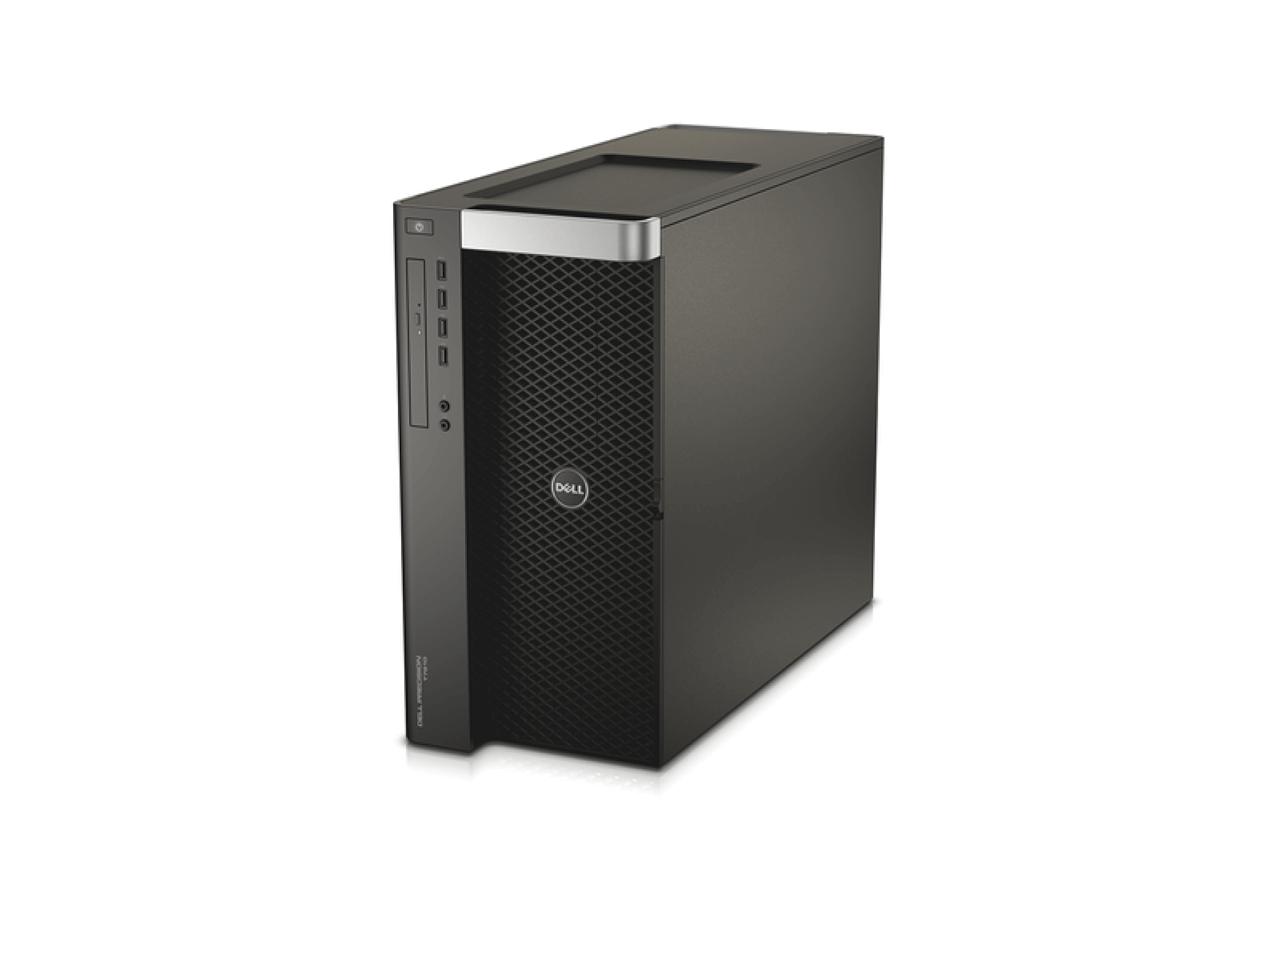 Dell Precision T5610 Xeon 2.6GH 32G 240GBSSD+2TB W10P Refurb